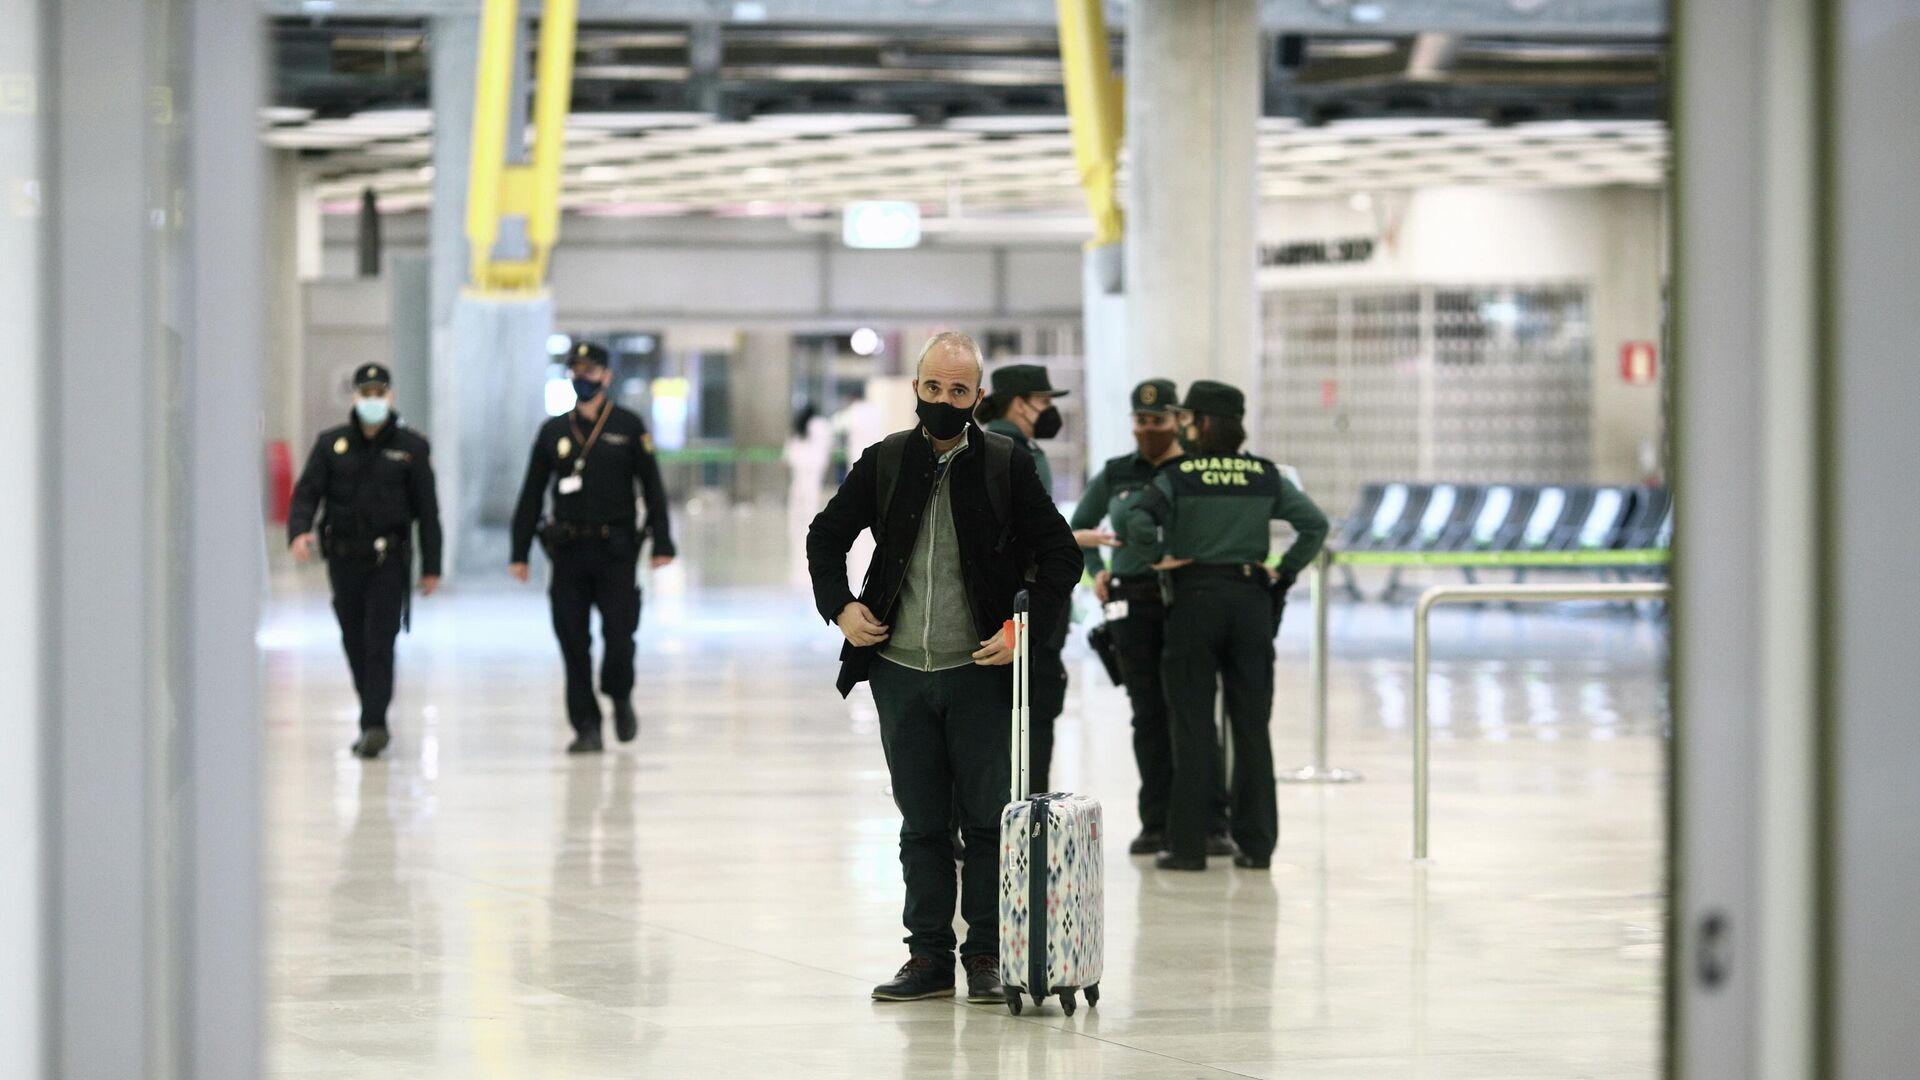 Un pasajero con maleta junto a agentes de la Guardia Civil en la terminal T4 del Aeropuerto de Madrid-Barajas Adolfo Suárez, en Madrid - Sputnik Mundo, 1920, 21.05.2021